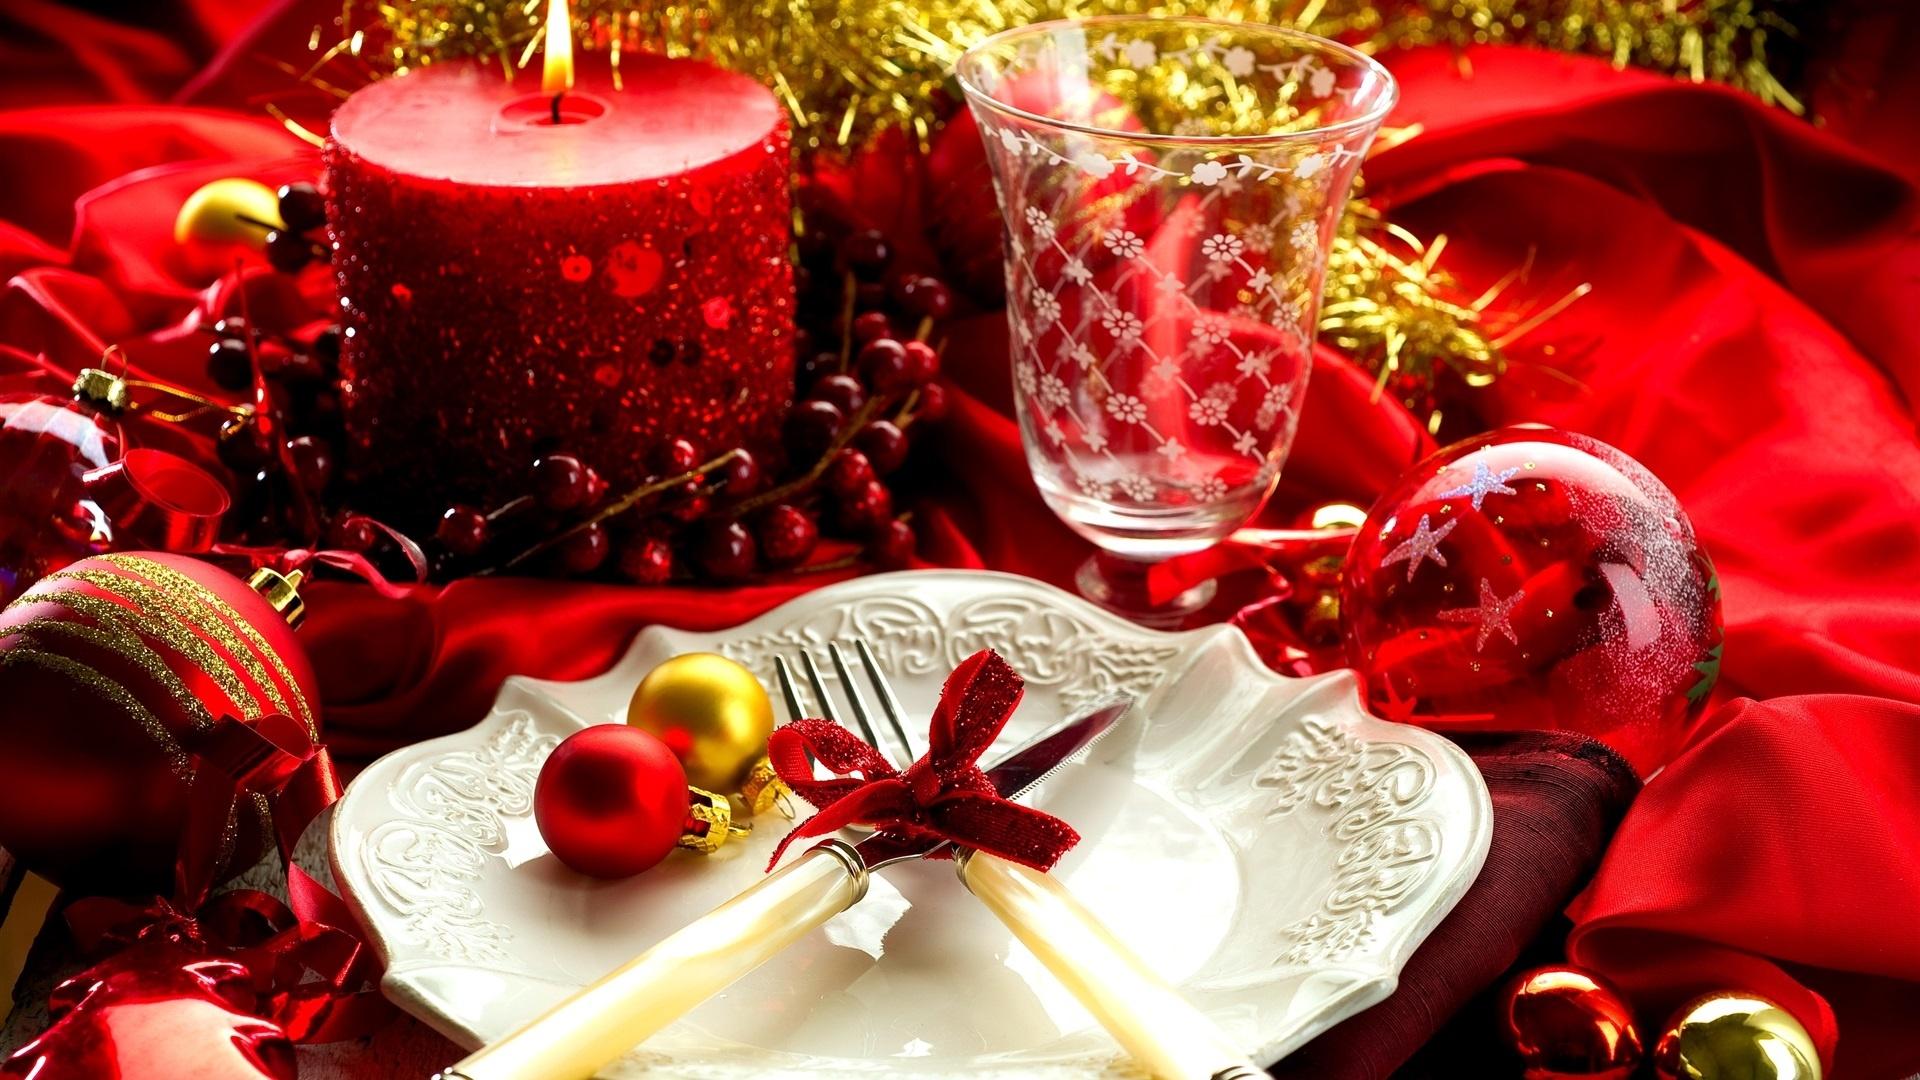 Christmas Dishes Image